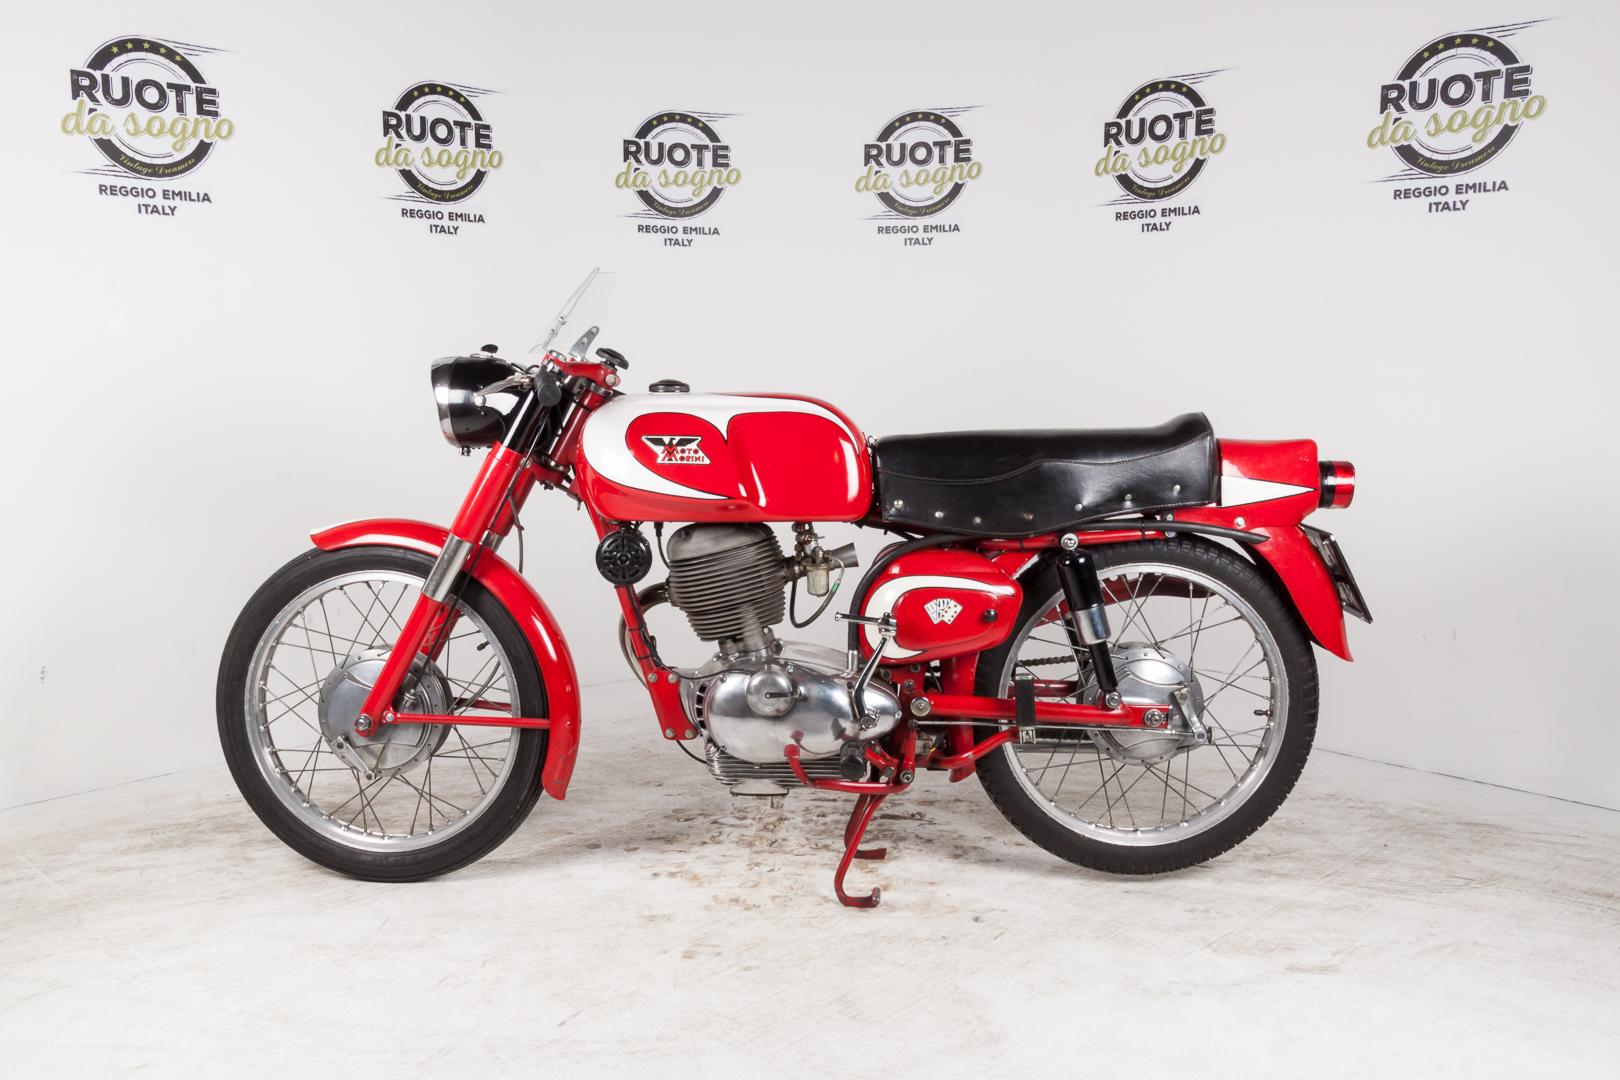 1957 Moto Morini 175 Moto Morini Moto D Epoca Ruote